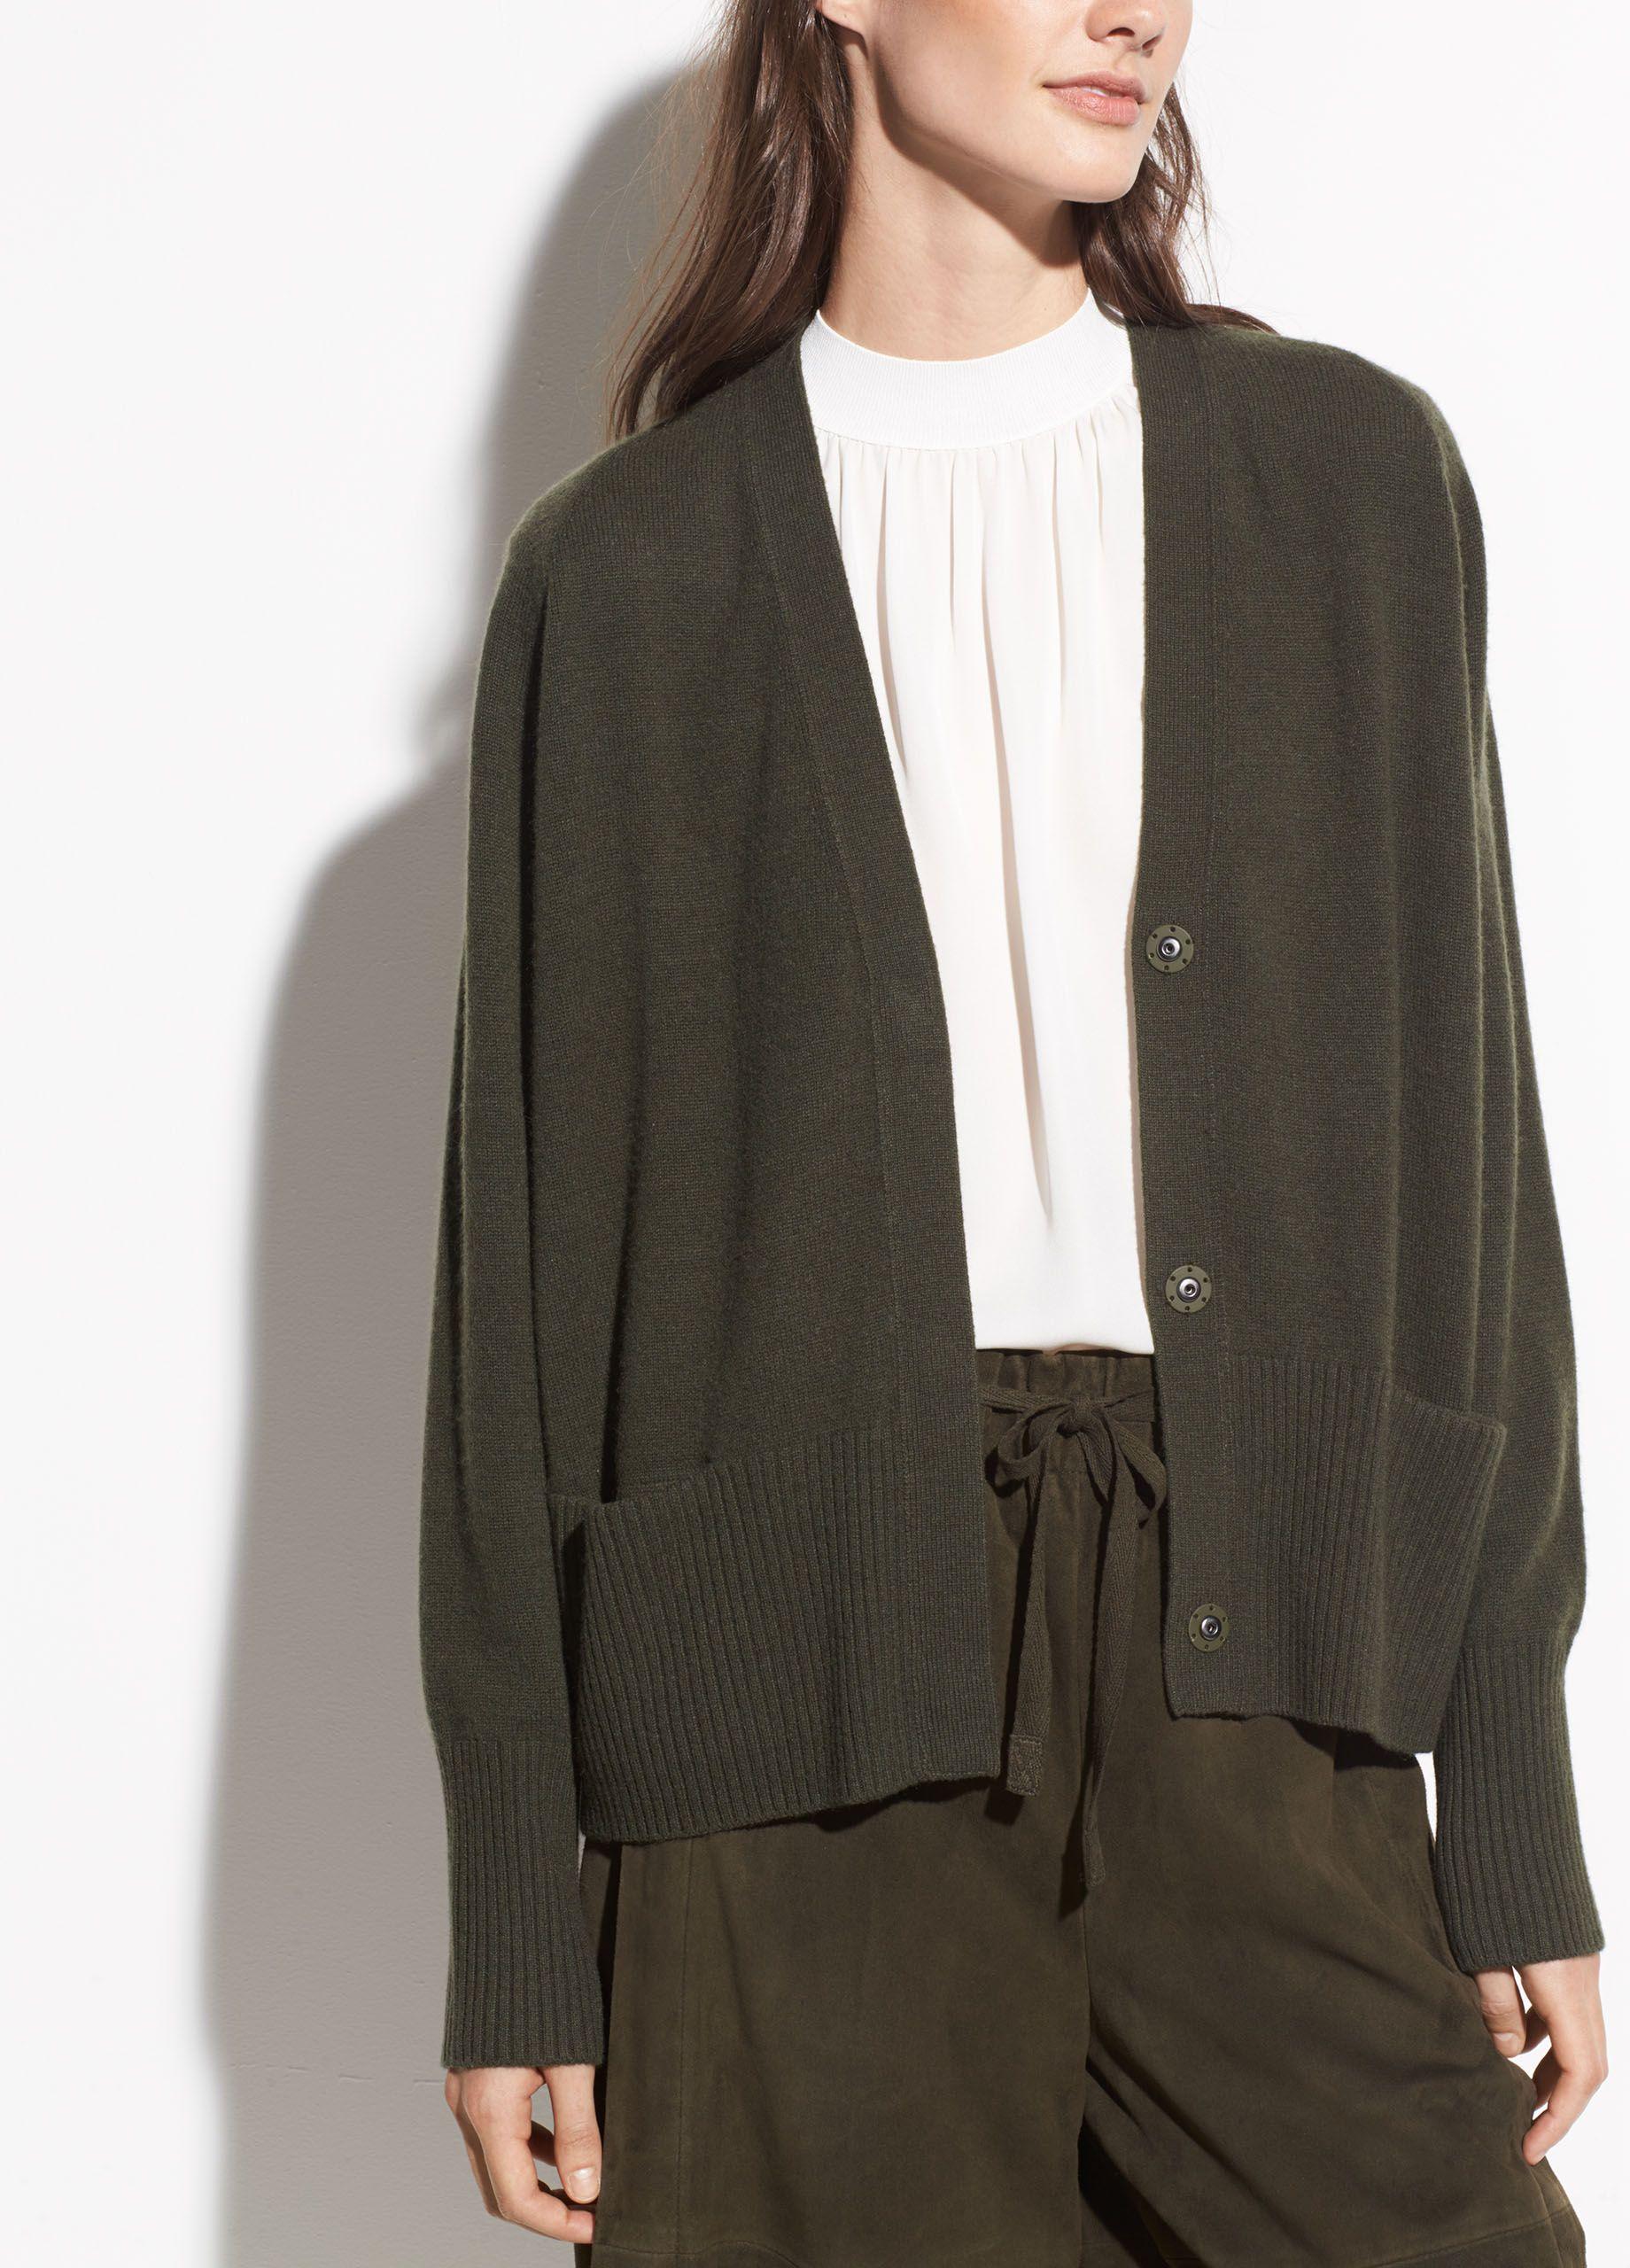 Kess InHouse Alyzen Moonshadow Hidden Face Multicolor Fleece Throw Blanket 60 by 50-Inch 60 X 50